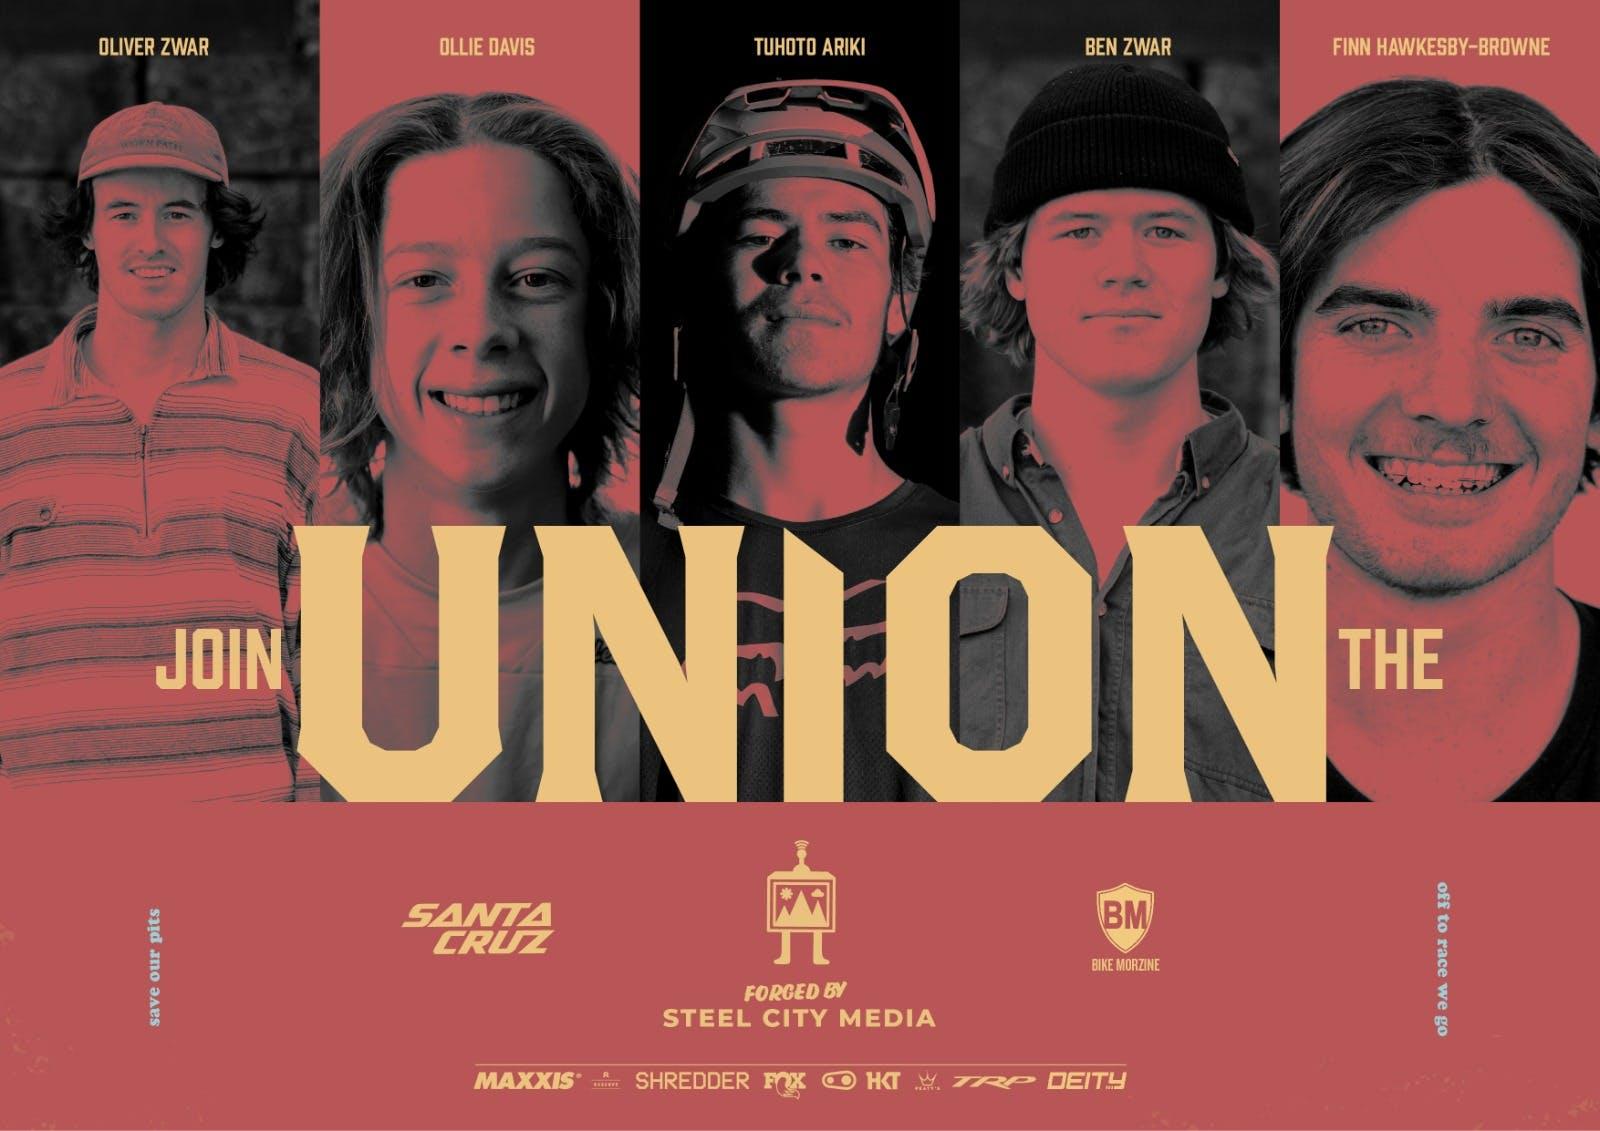 The Union - Team Portraits